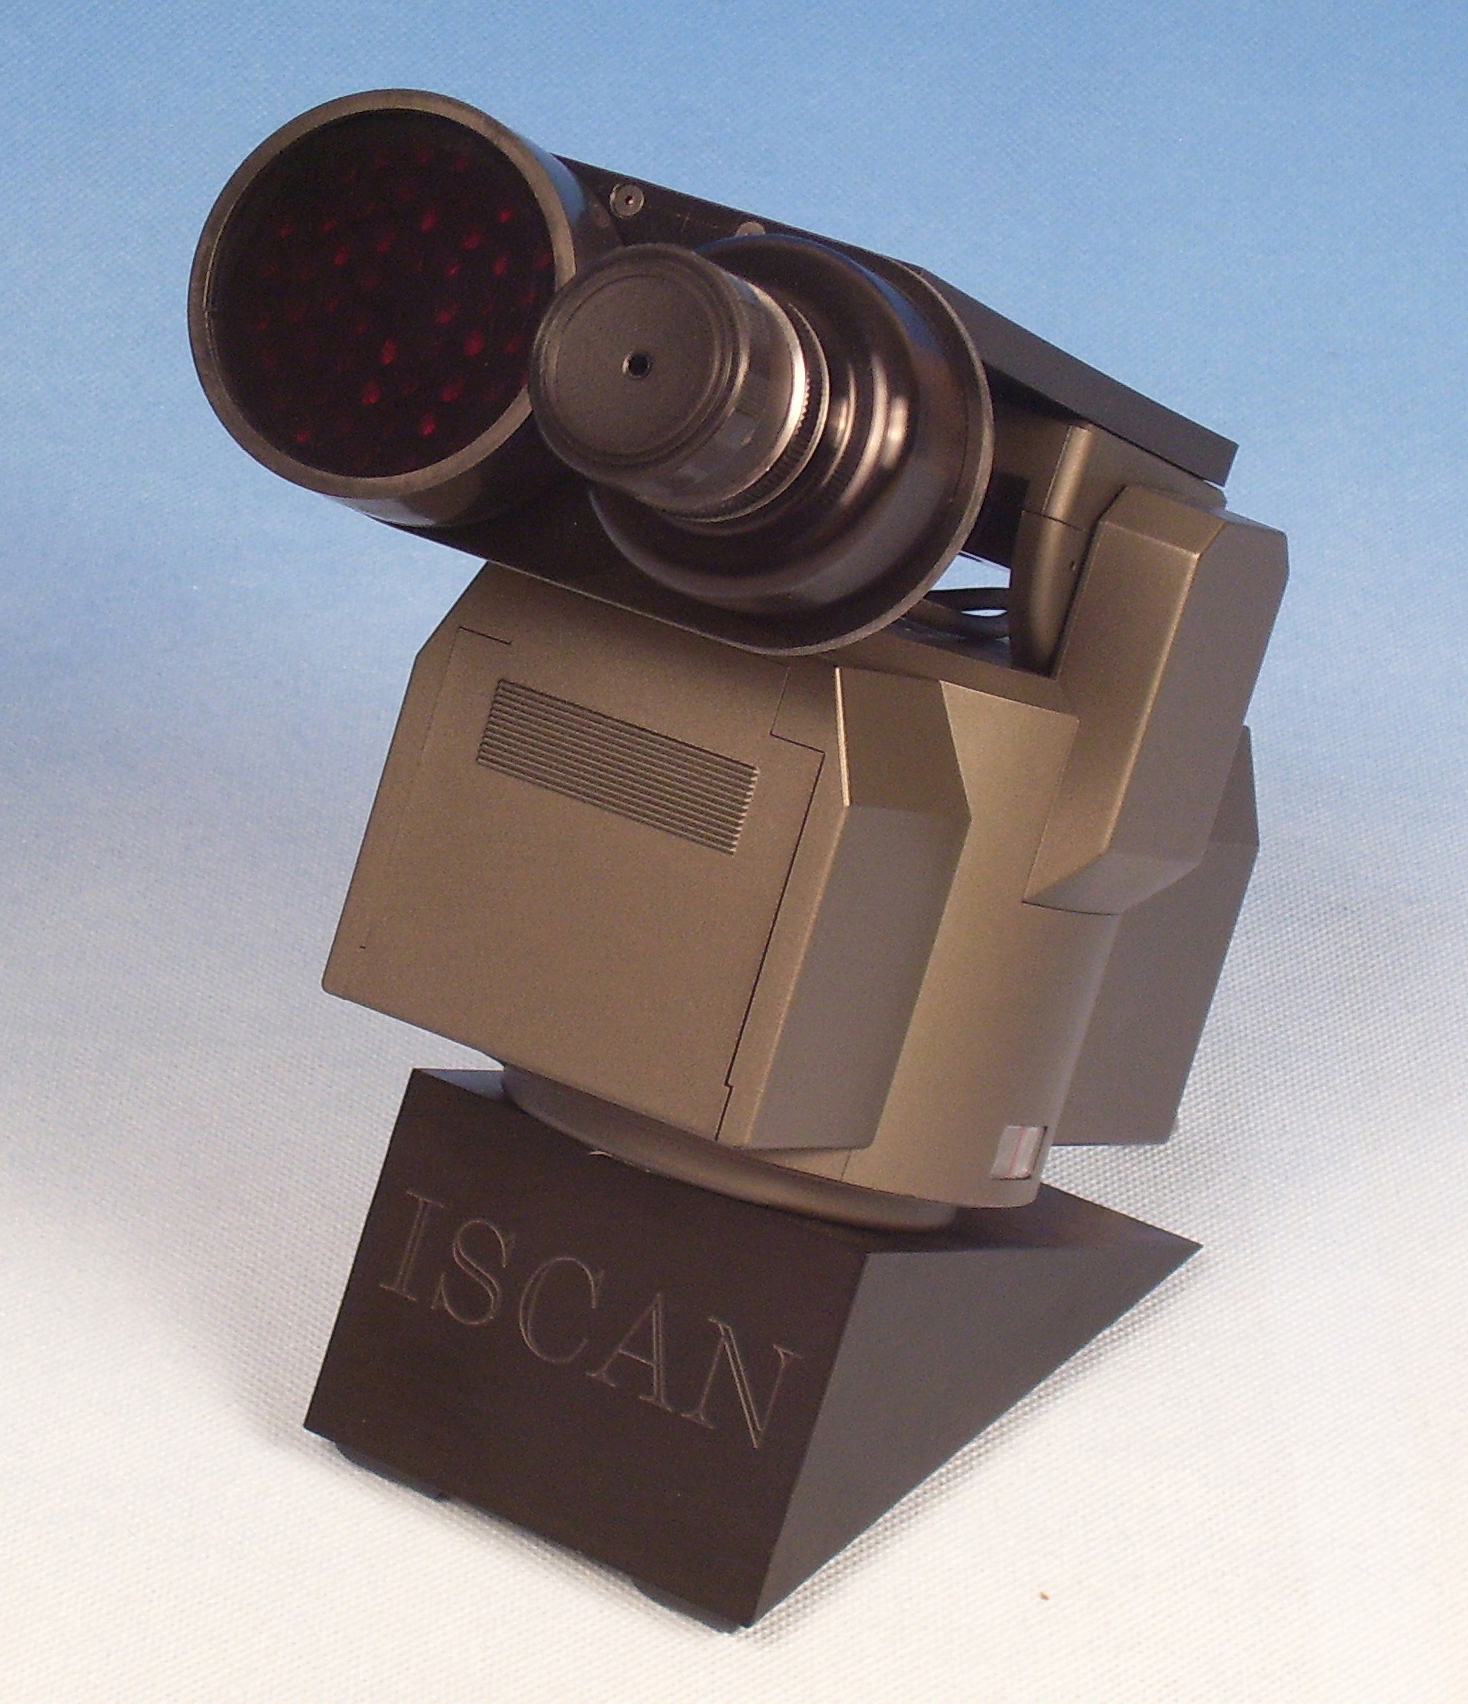 VisionTrak Binocular Desktop 300 System